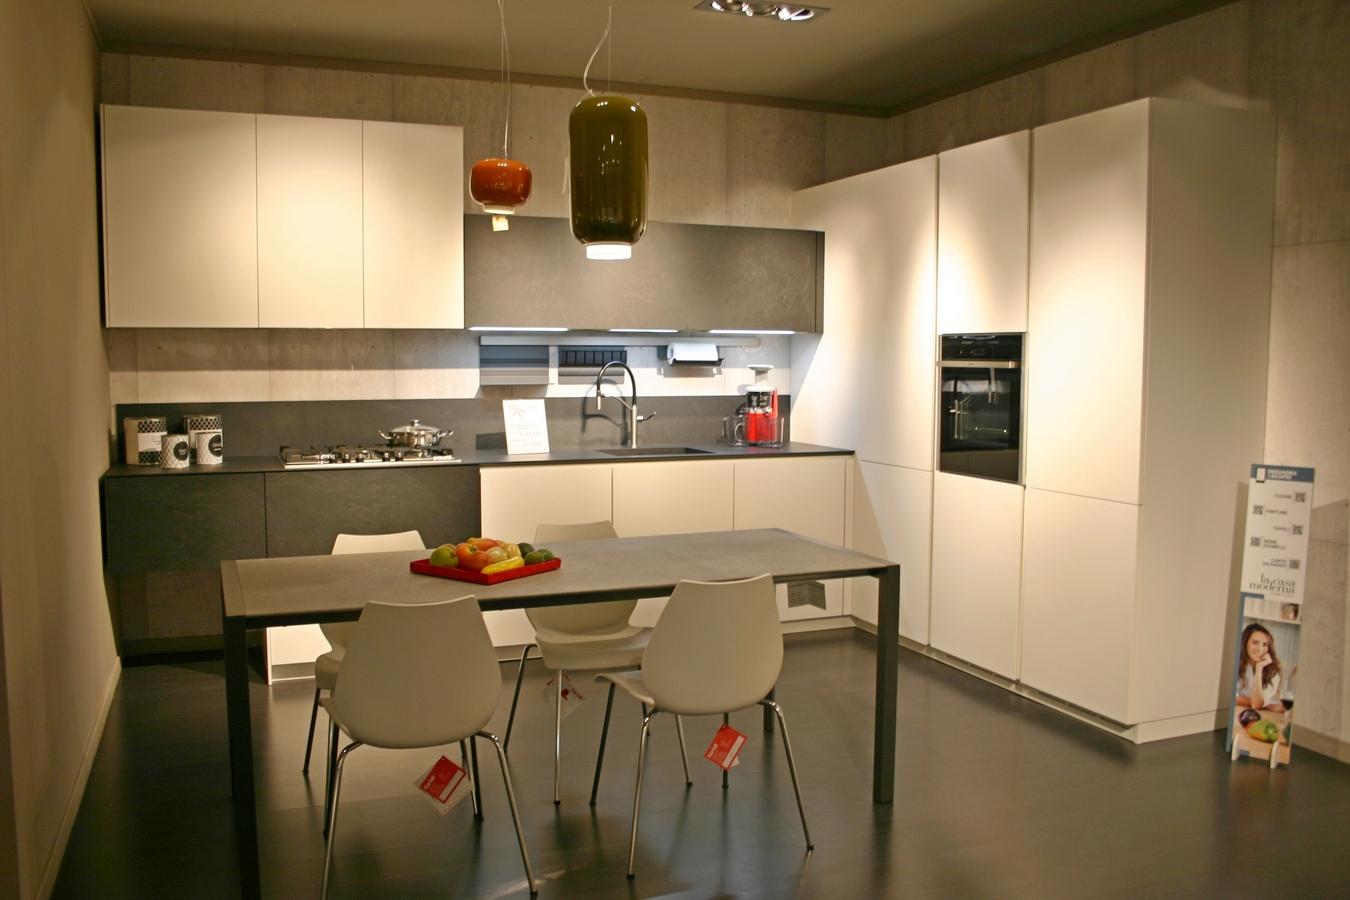 Cucine da esposizione a prezzi scontati for Casa moderna orari